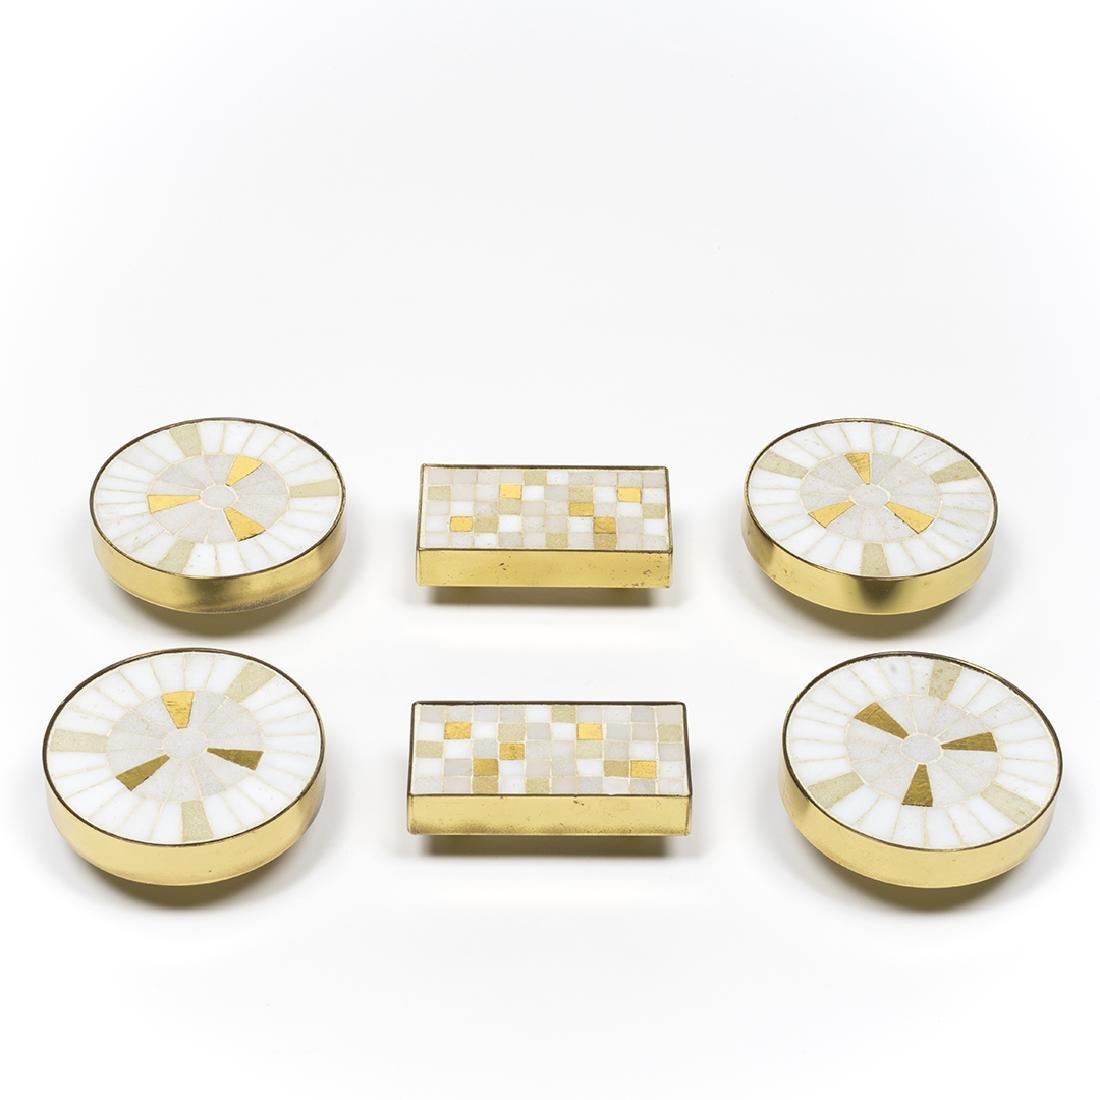 Tiled Brass Cabinet Pulls - 3